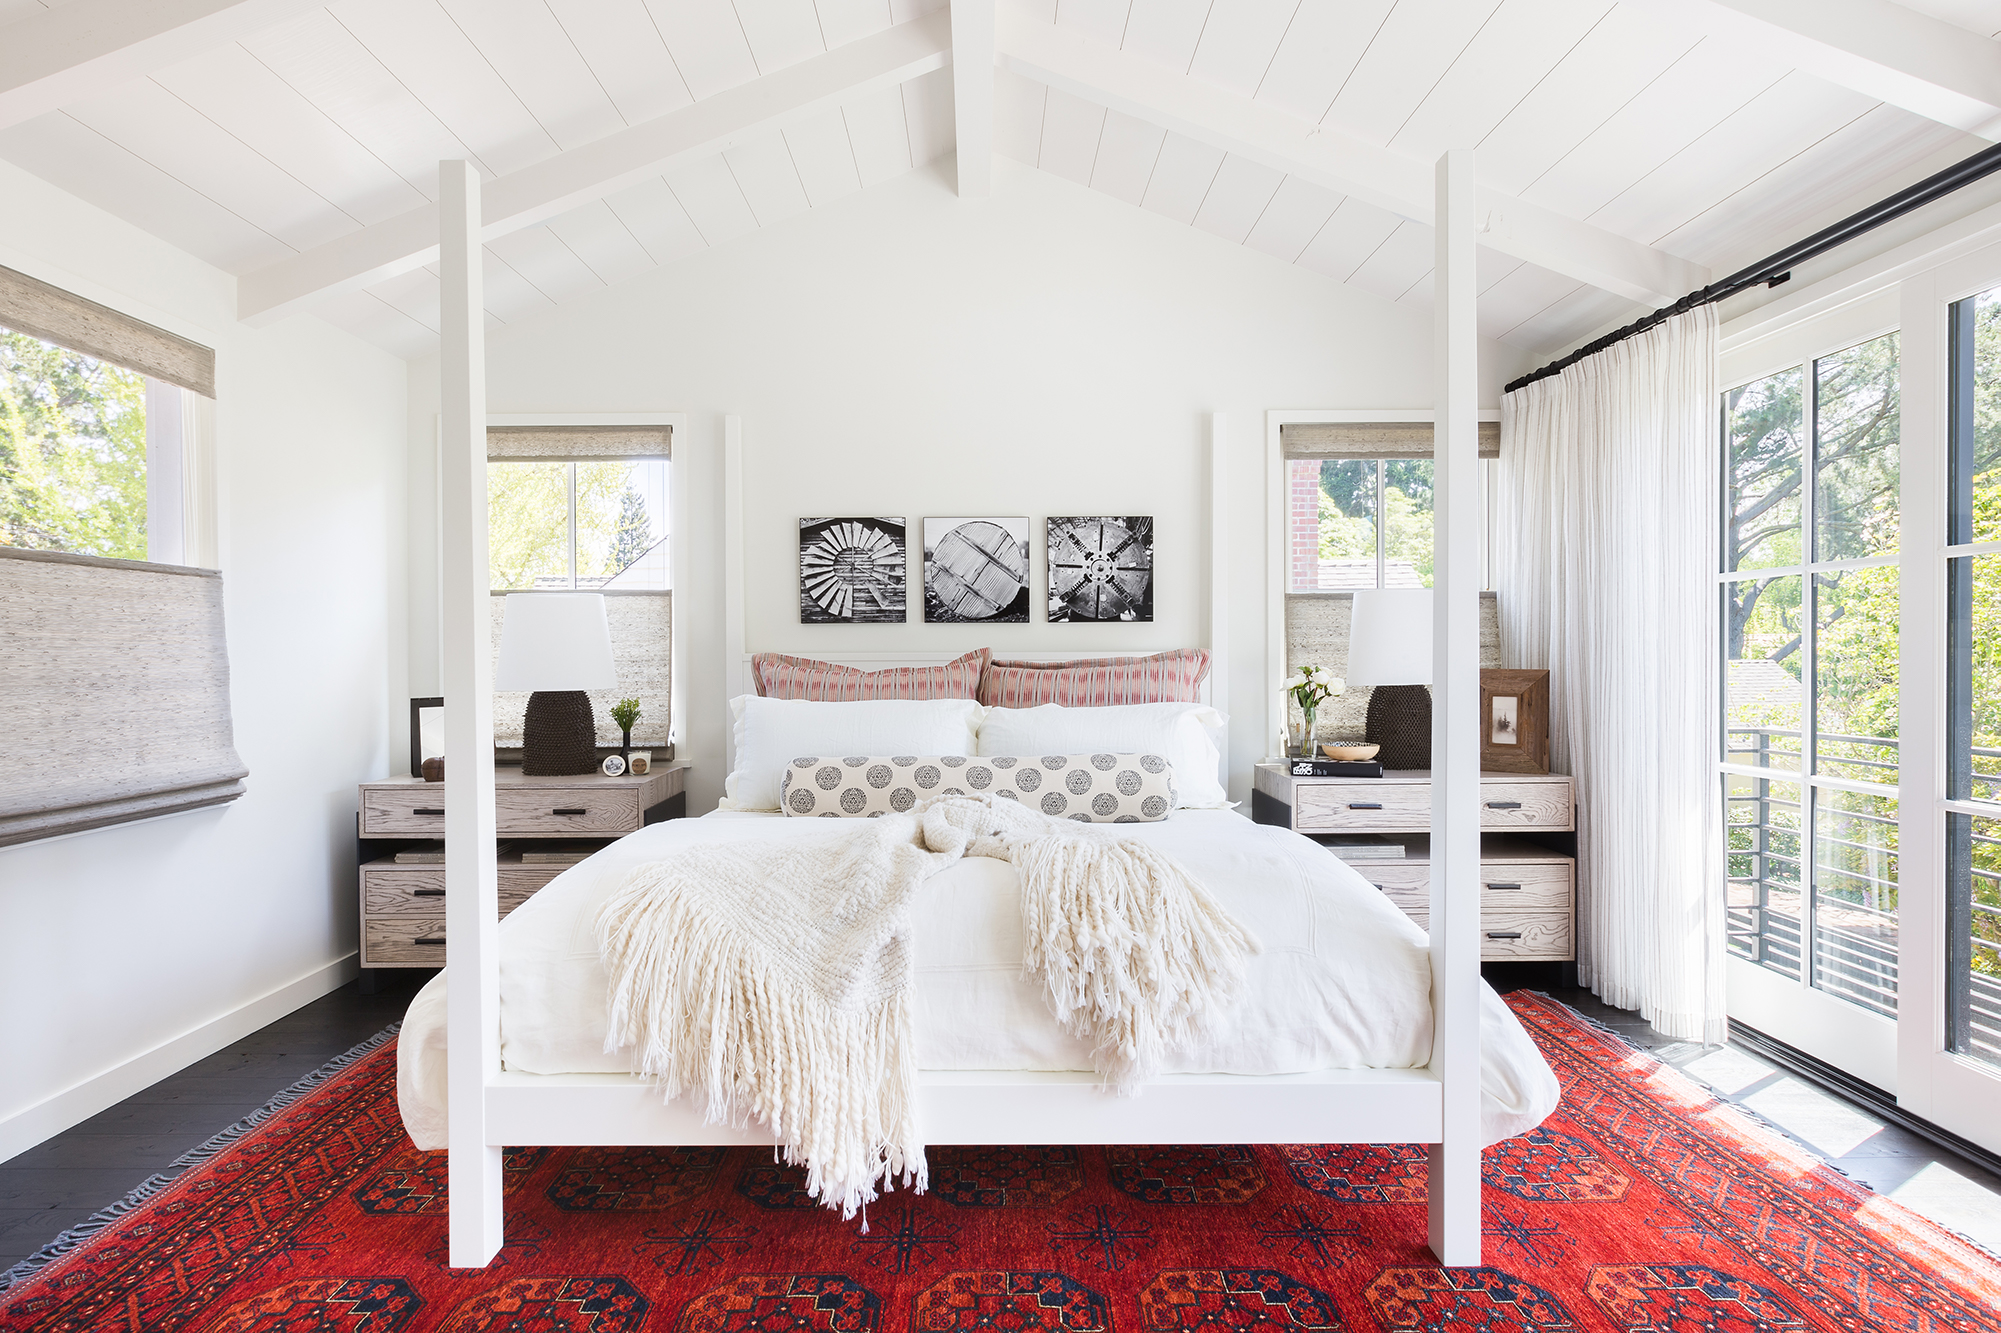 Jennifer_robins_interiors_projects_south_bay_AlyssaRosenheck2016-67_bedroom